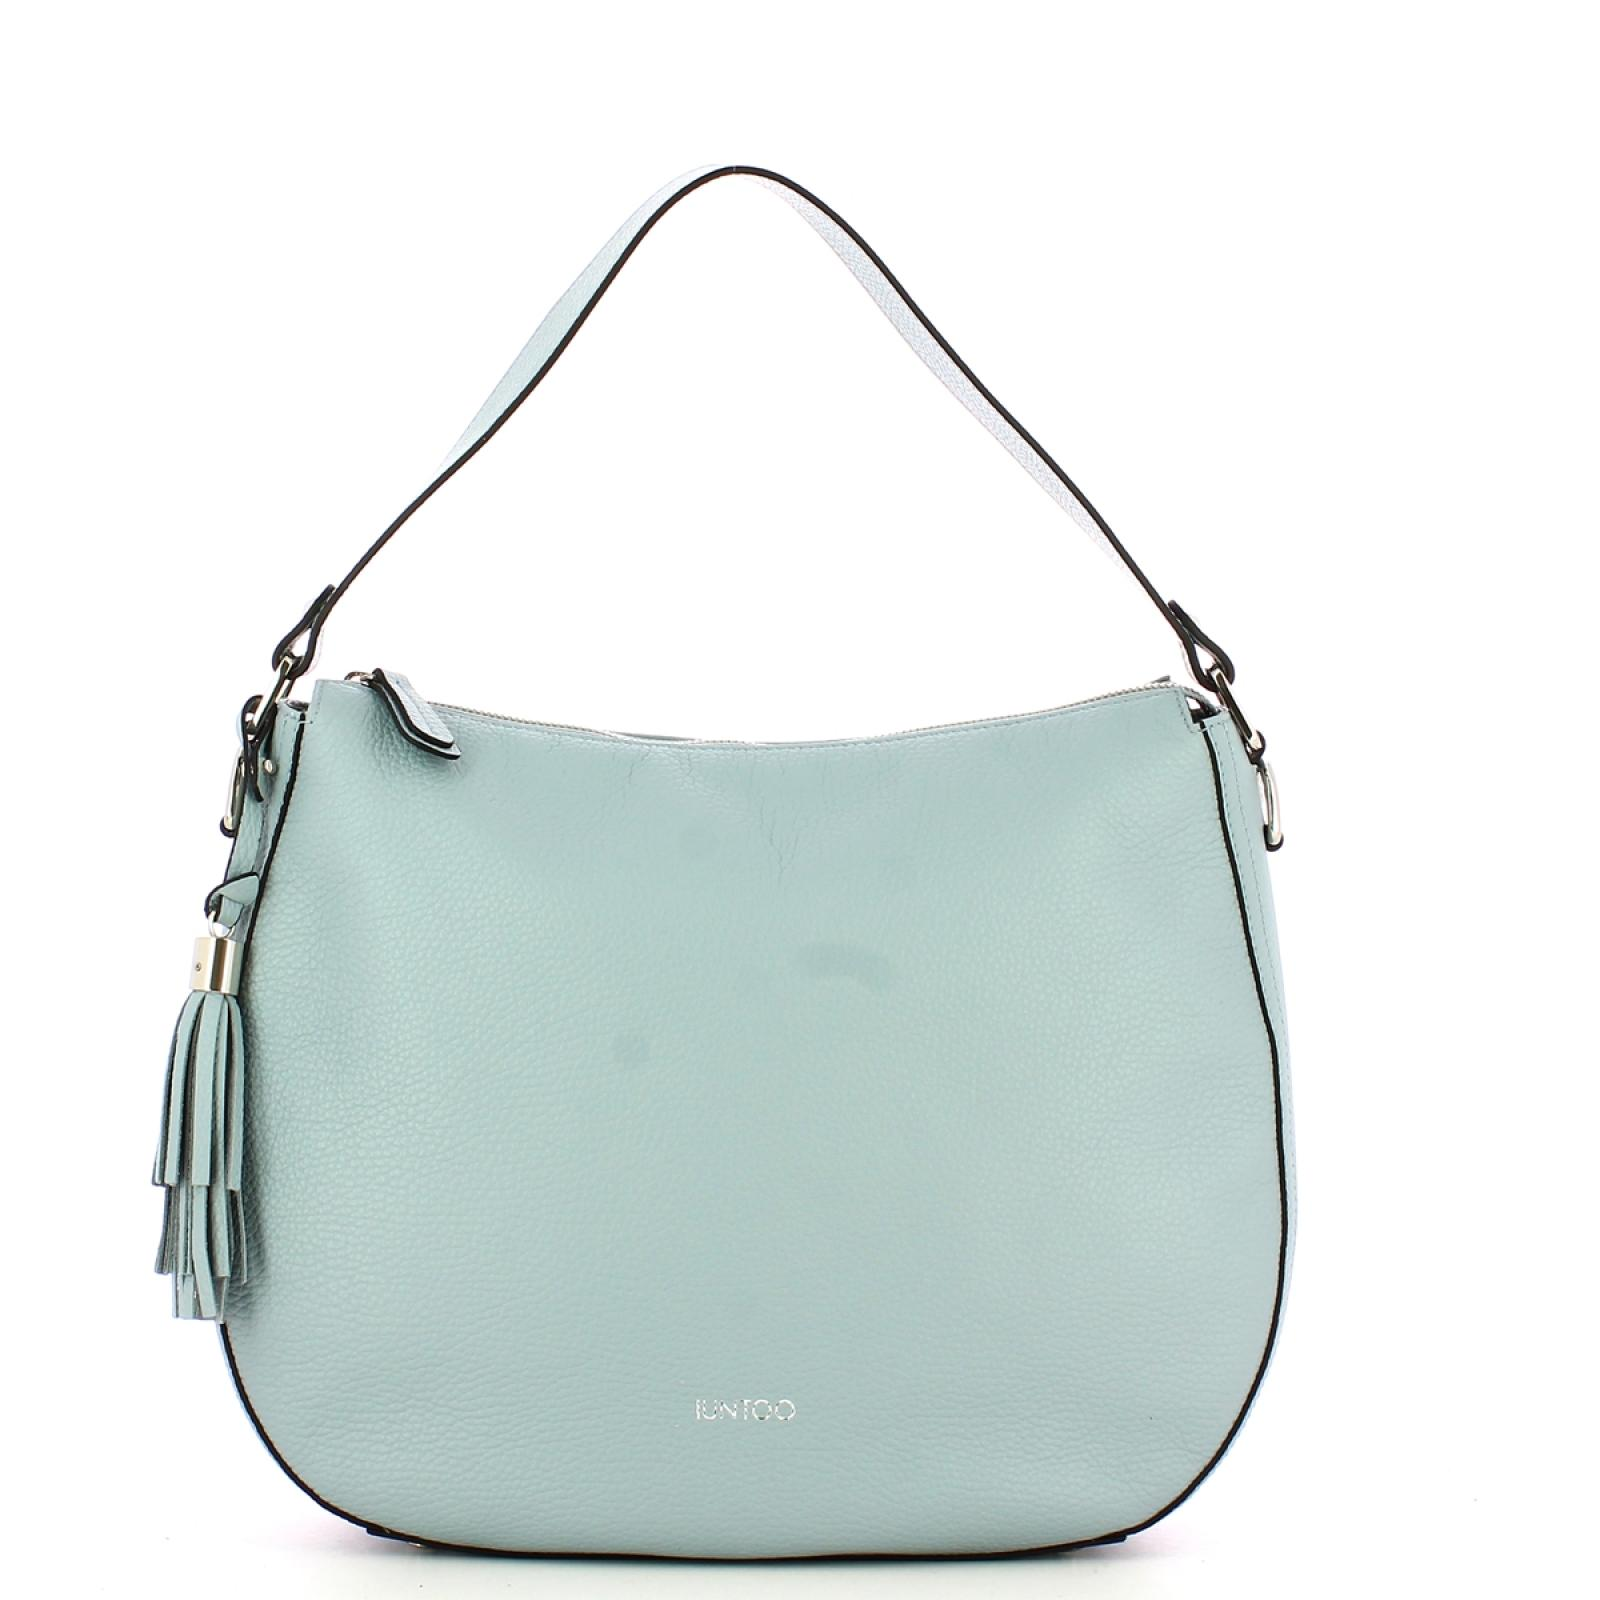 Iuntoo Hobo Bag in pelle Armonia - 1